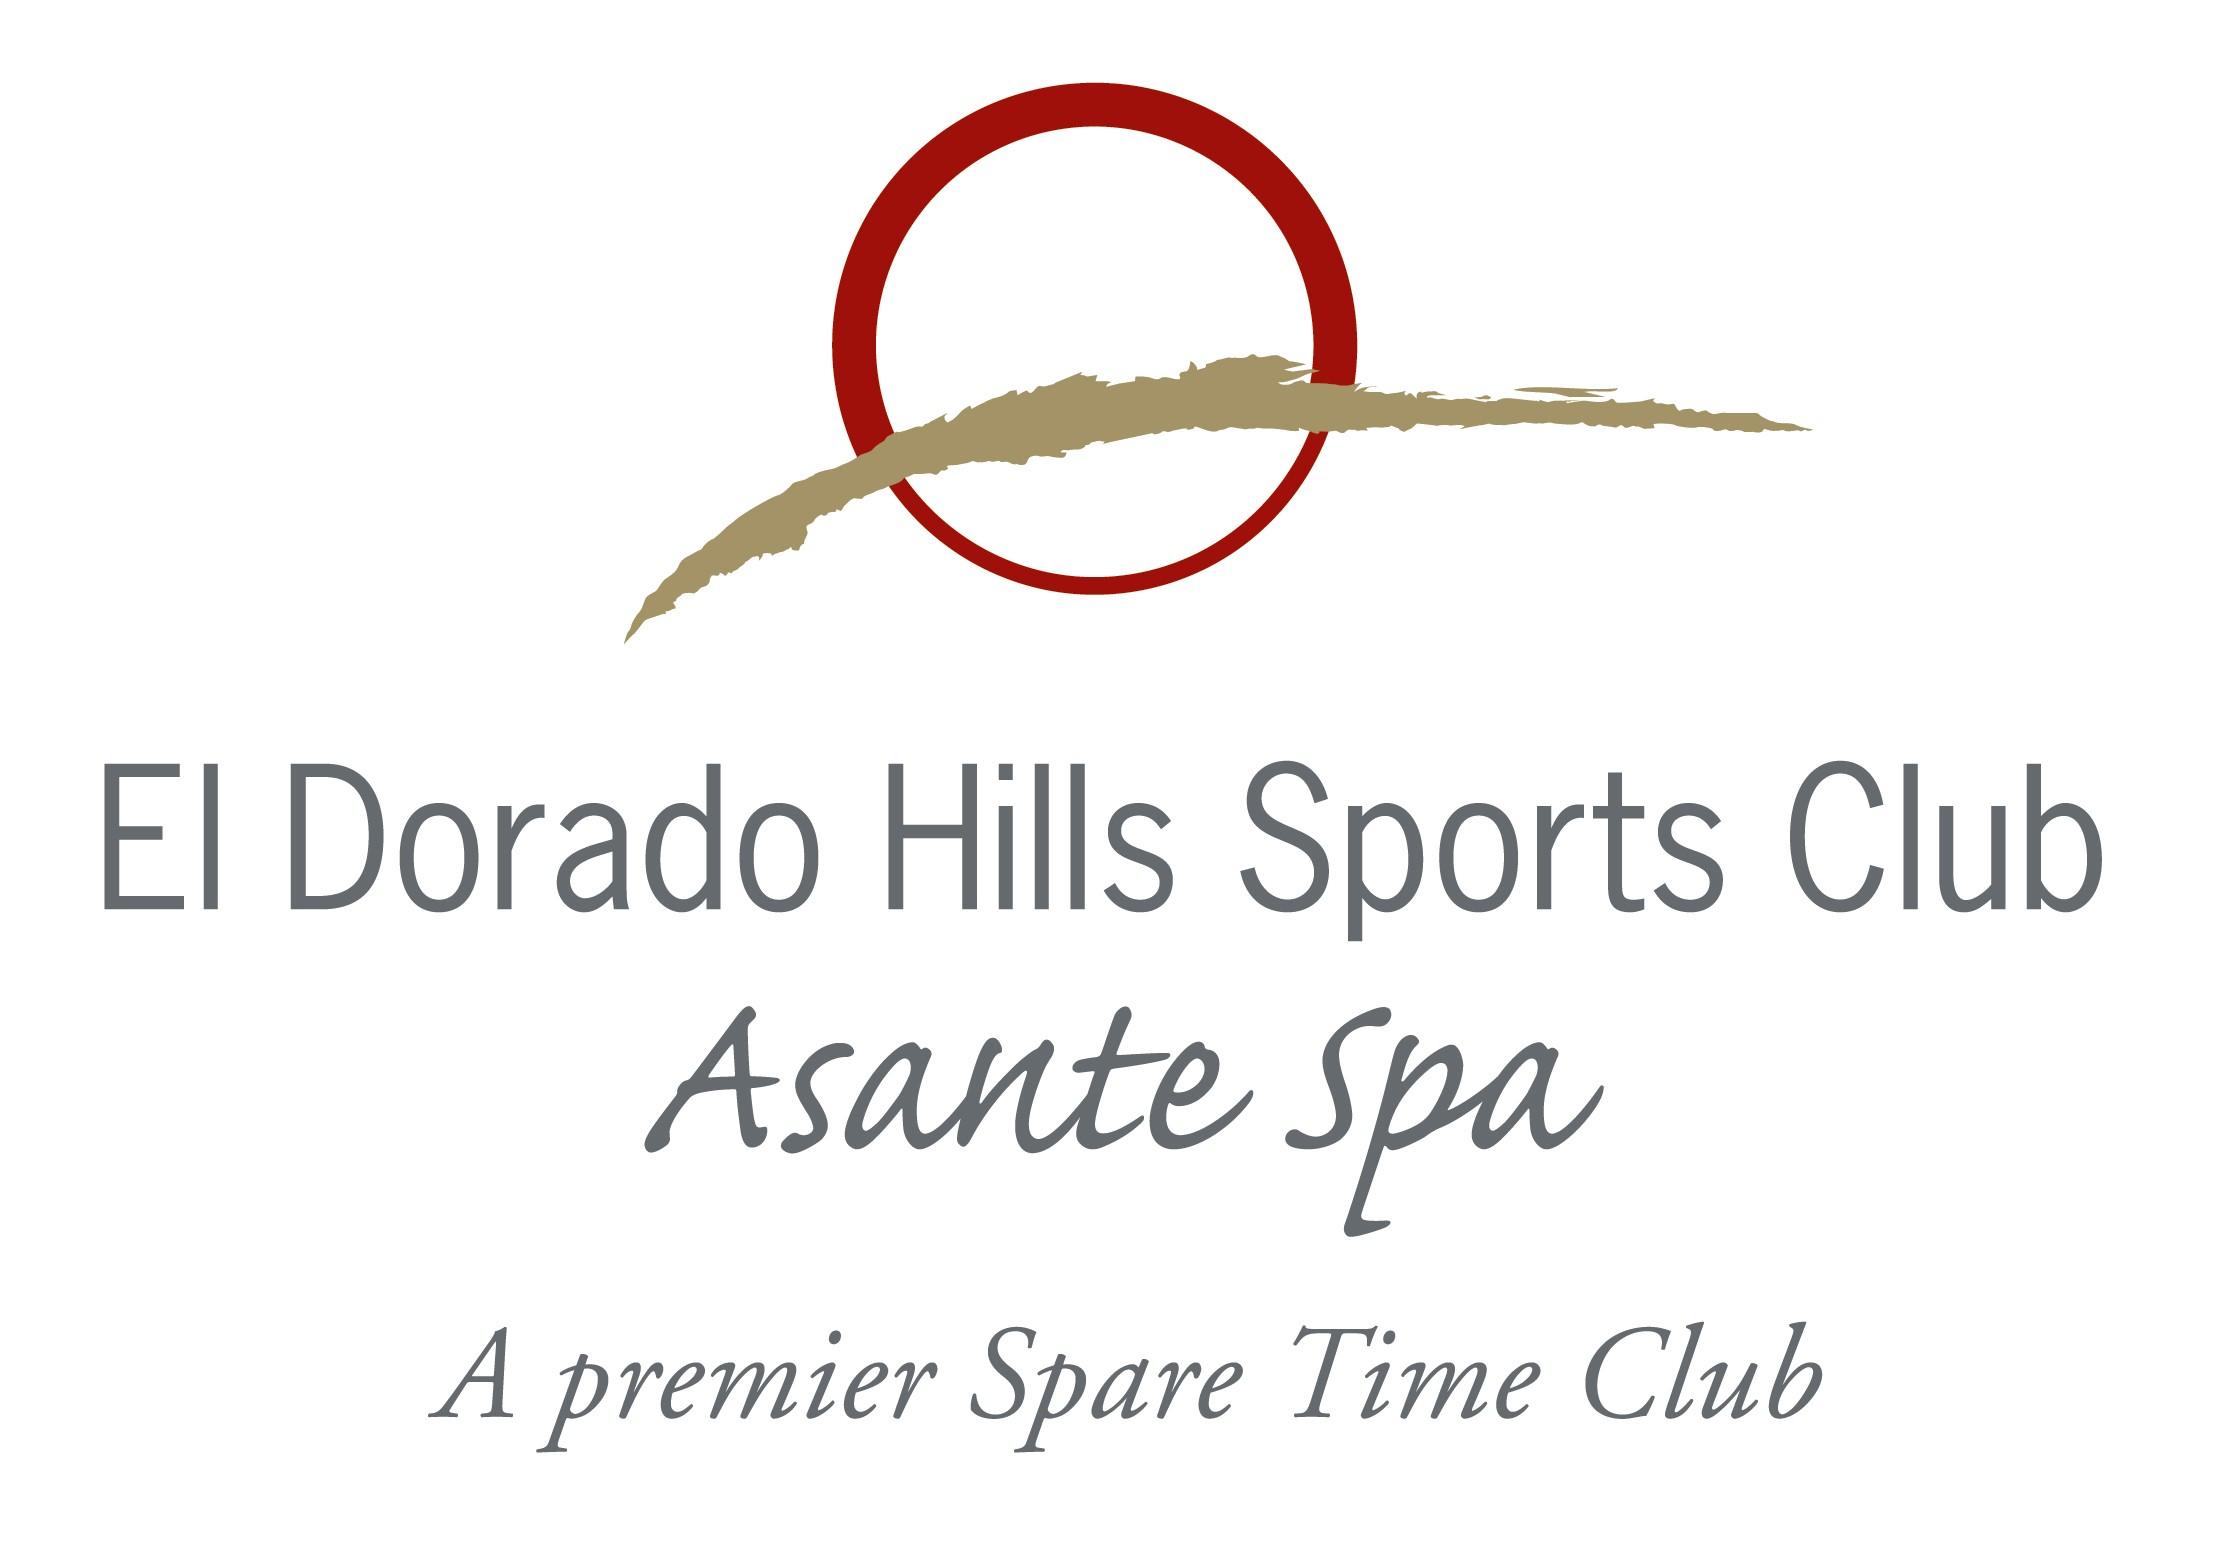 EDH & Asante Spa with Premier Tag Line Logo